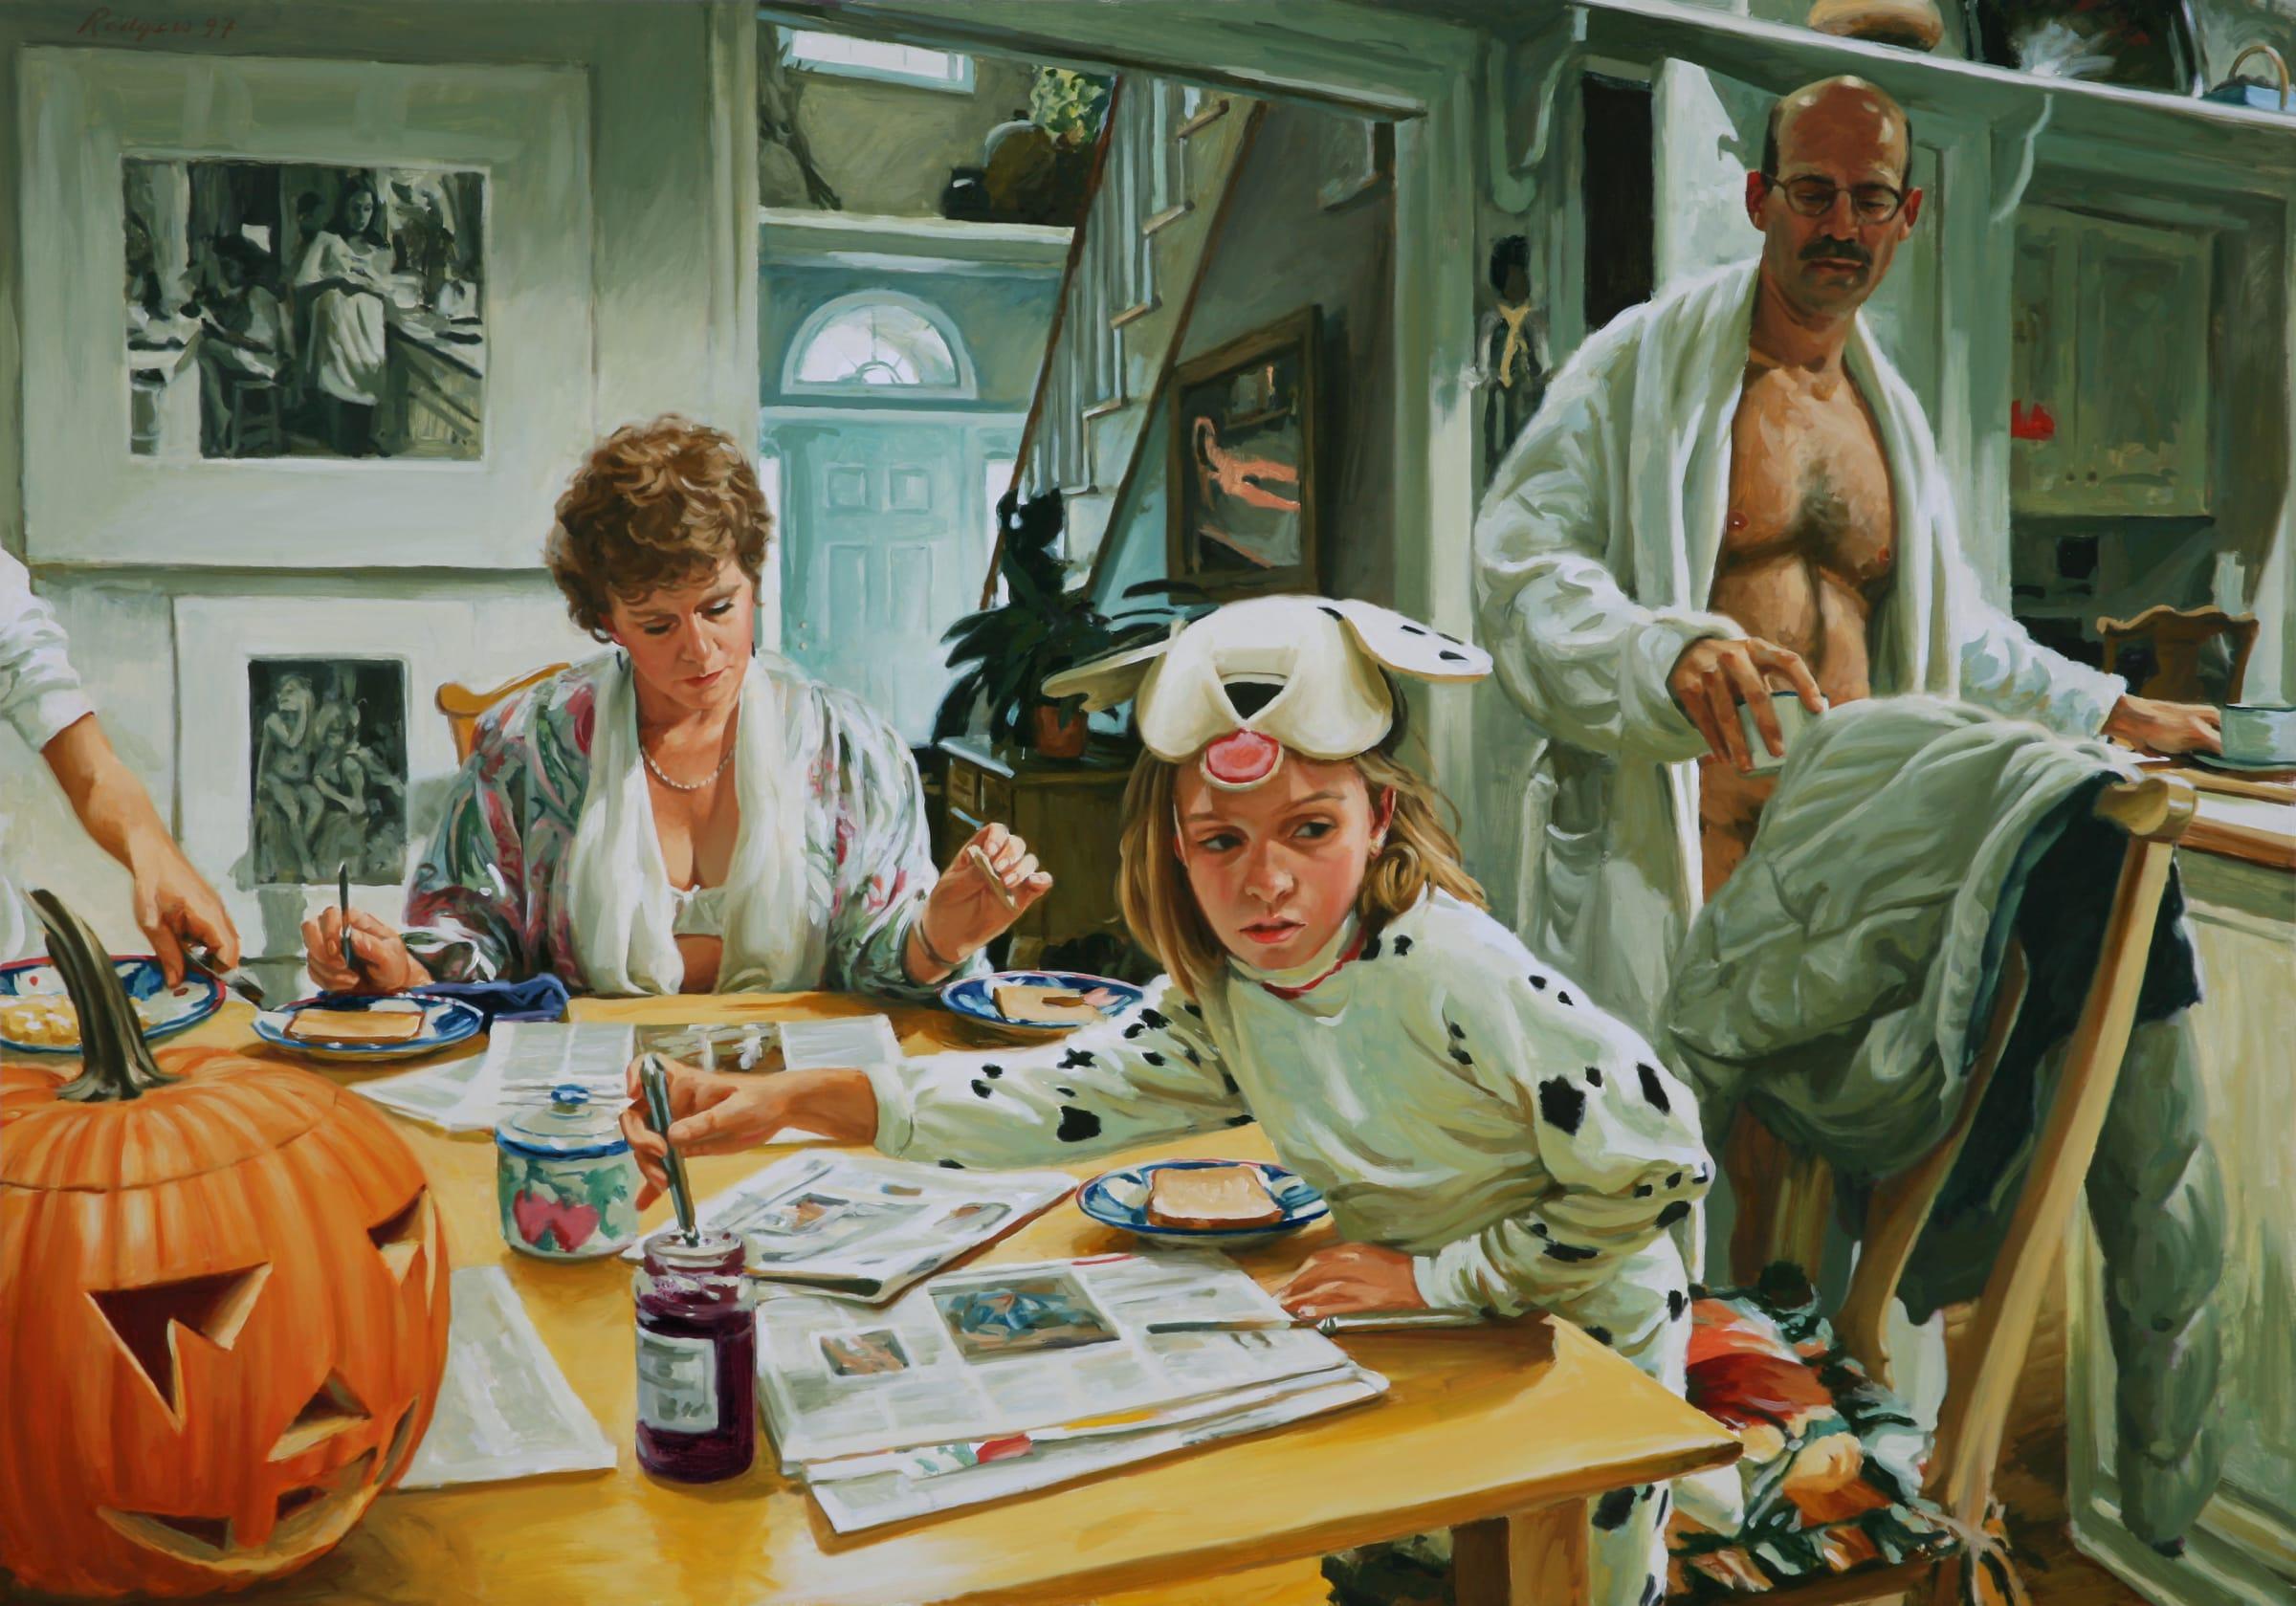 "<span class=""link fancybox-details-link""><a href=""/privateviews/706cde57ece7cfff2853da/12230/"">View Detail Page</a></span><div class=""artist""><strong>Terry RODGERS</strong></div> <div class=""title""><em> Halloween Breakfast</em>, 1997</div> <div class=""medium"">oil on linen</div> <div class=""dimensions"">137 x 196 cm<br /> 54 x 77 1/8 in</div><div class=""copyright_line"">Copyright The Artist</div>"